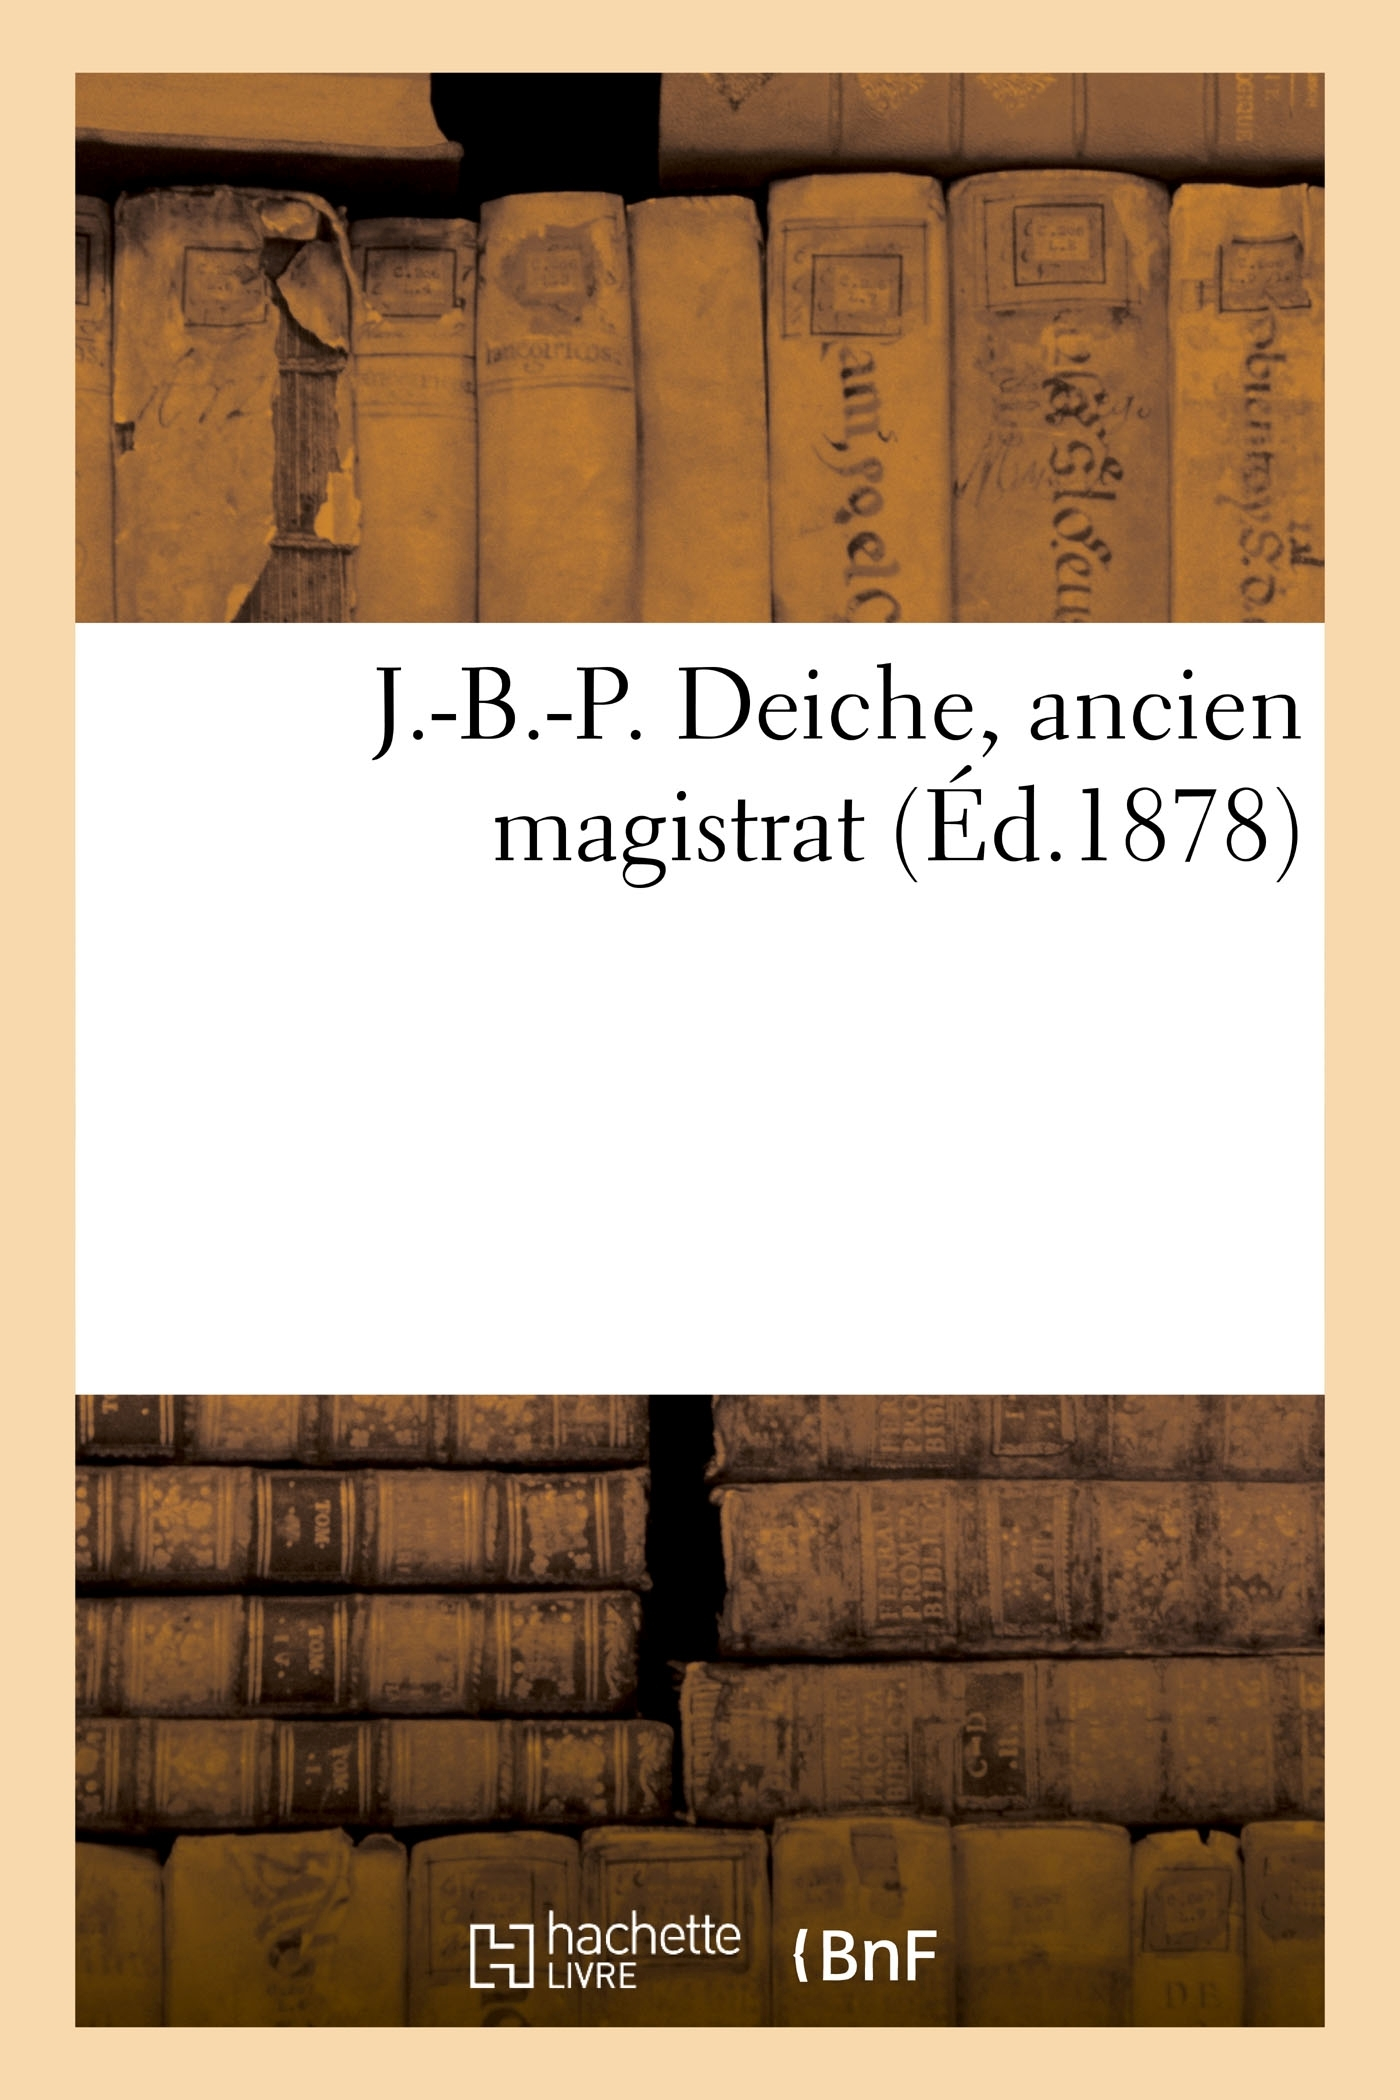 J.-B.-P. DEICHE, ANCIEN MAGISTRAT